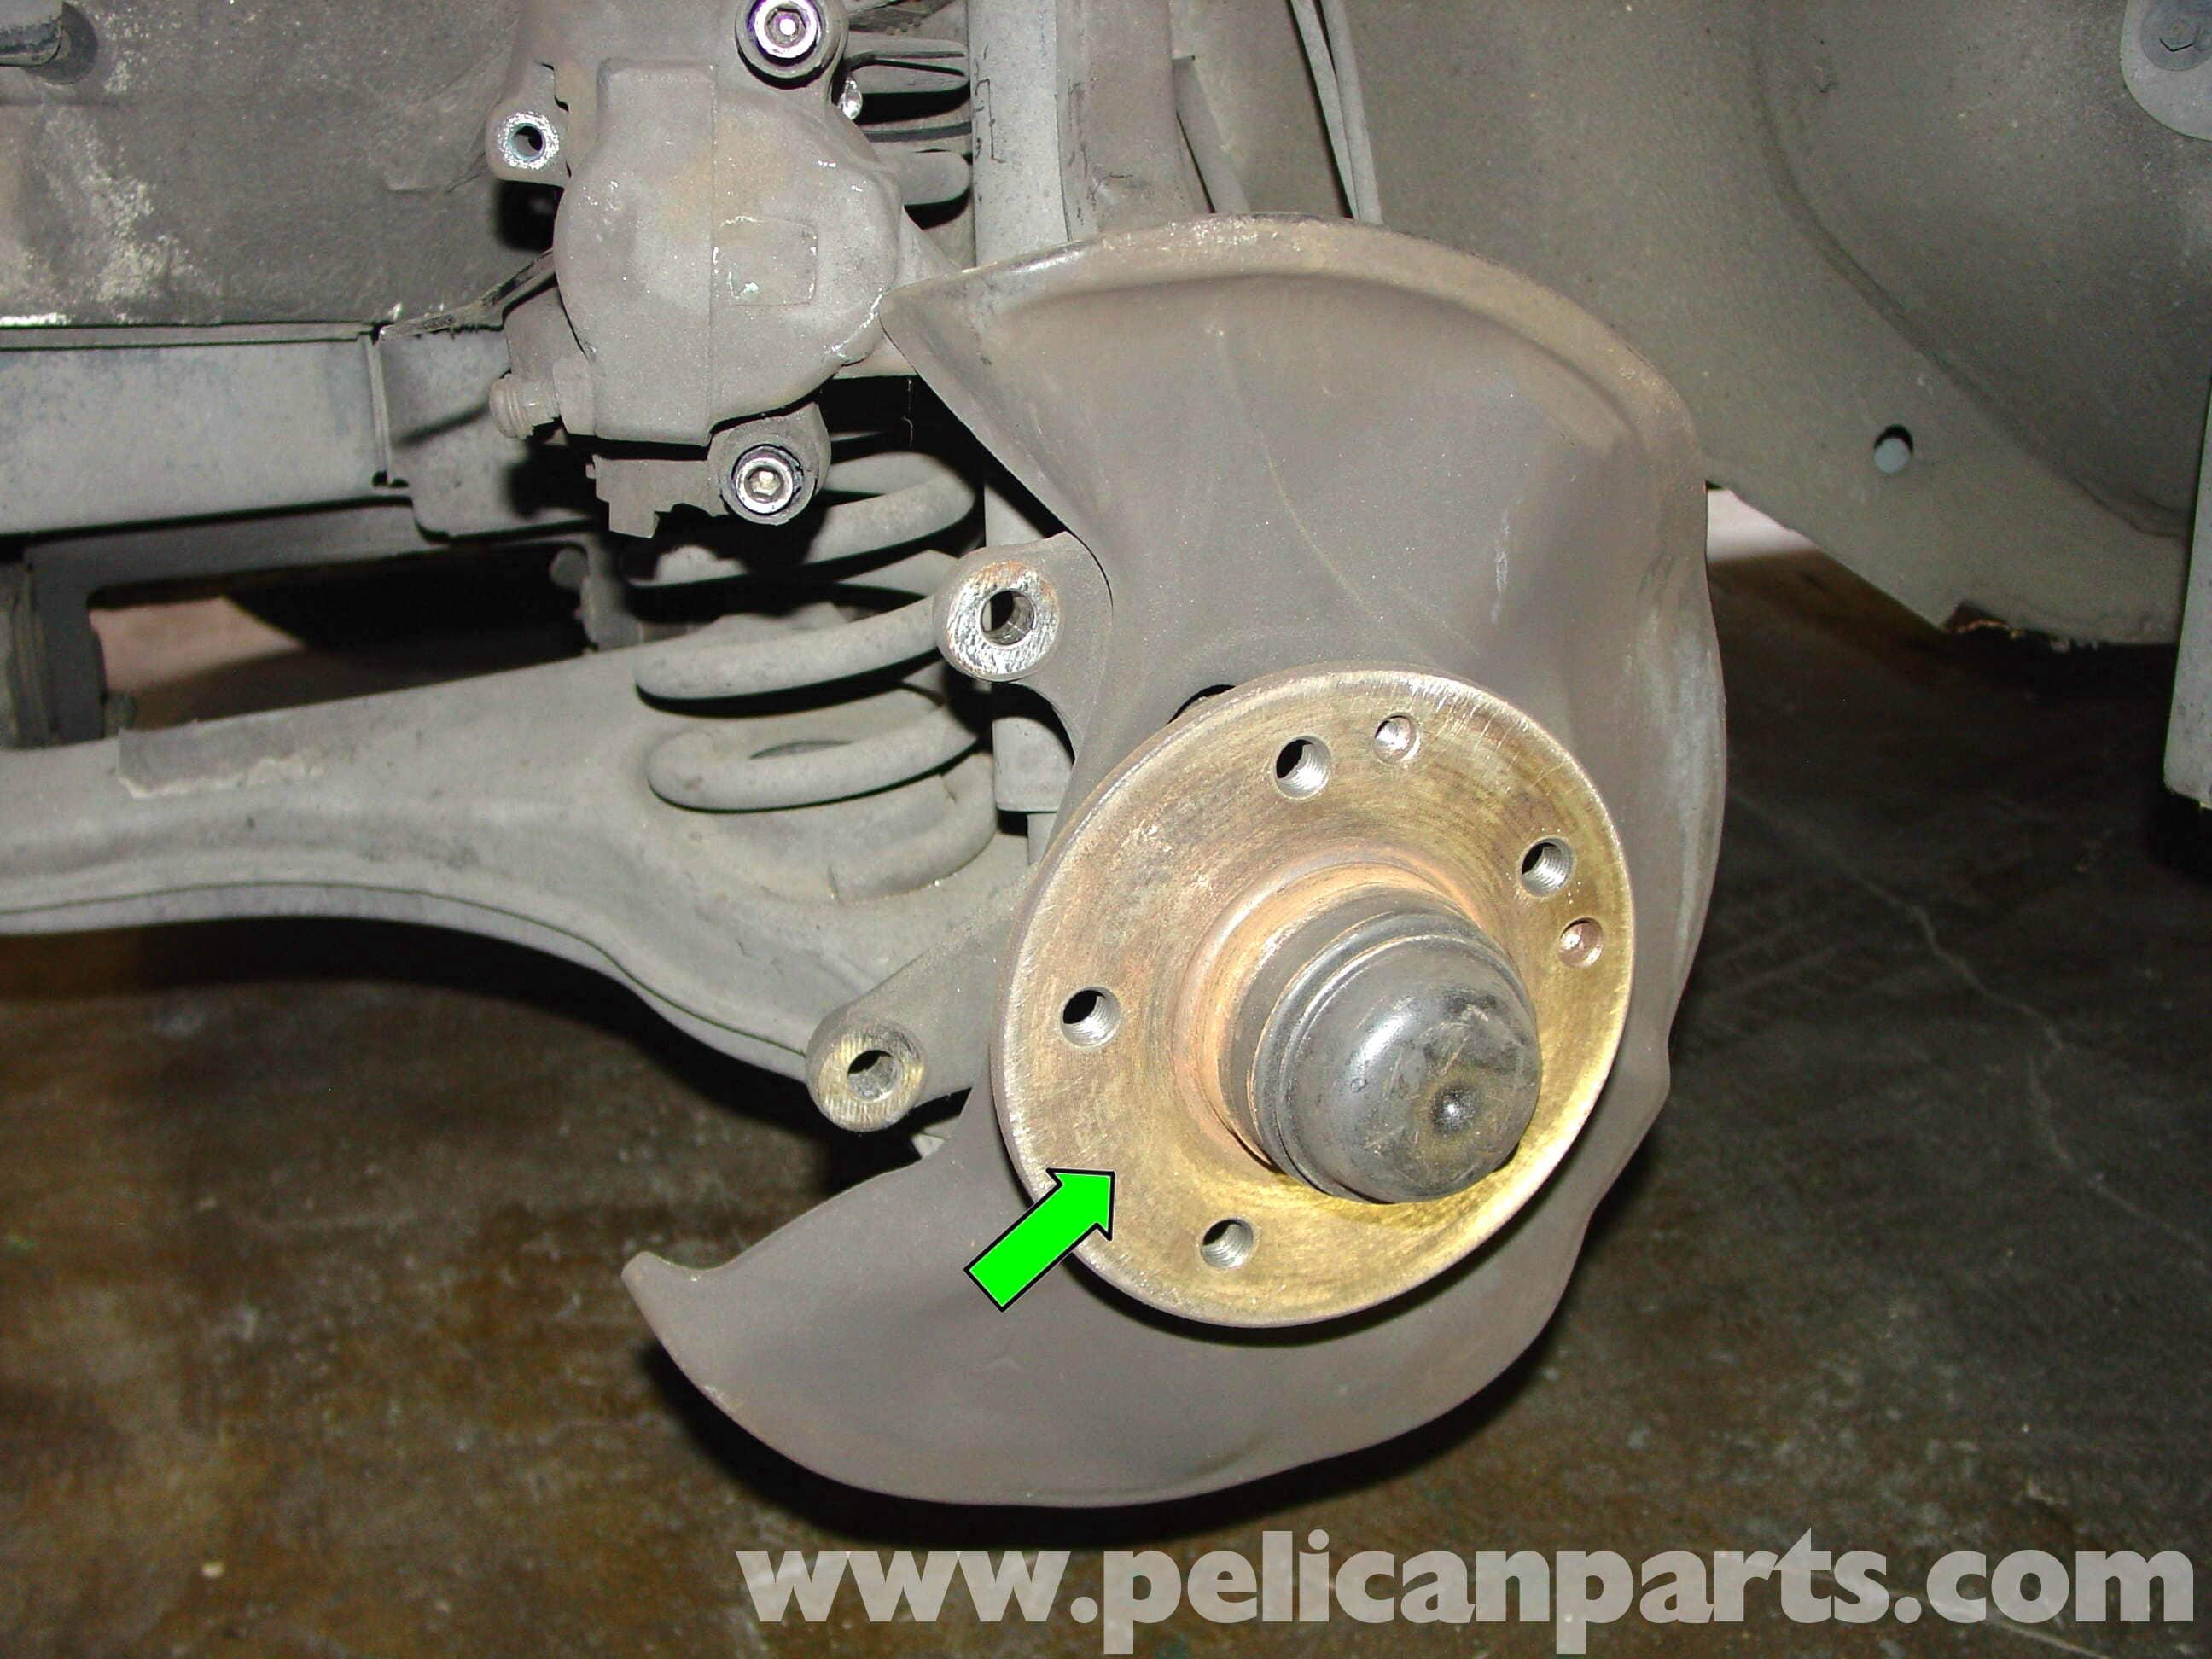 Mercedes benz w210 front brake pad disc replacement 1996 for Replacement parts for mercedes benz